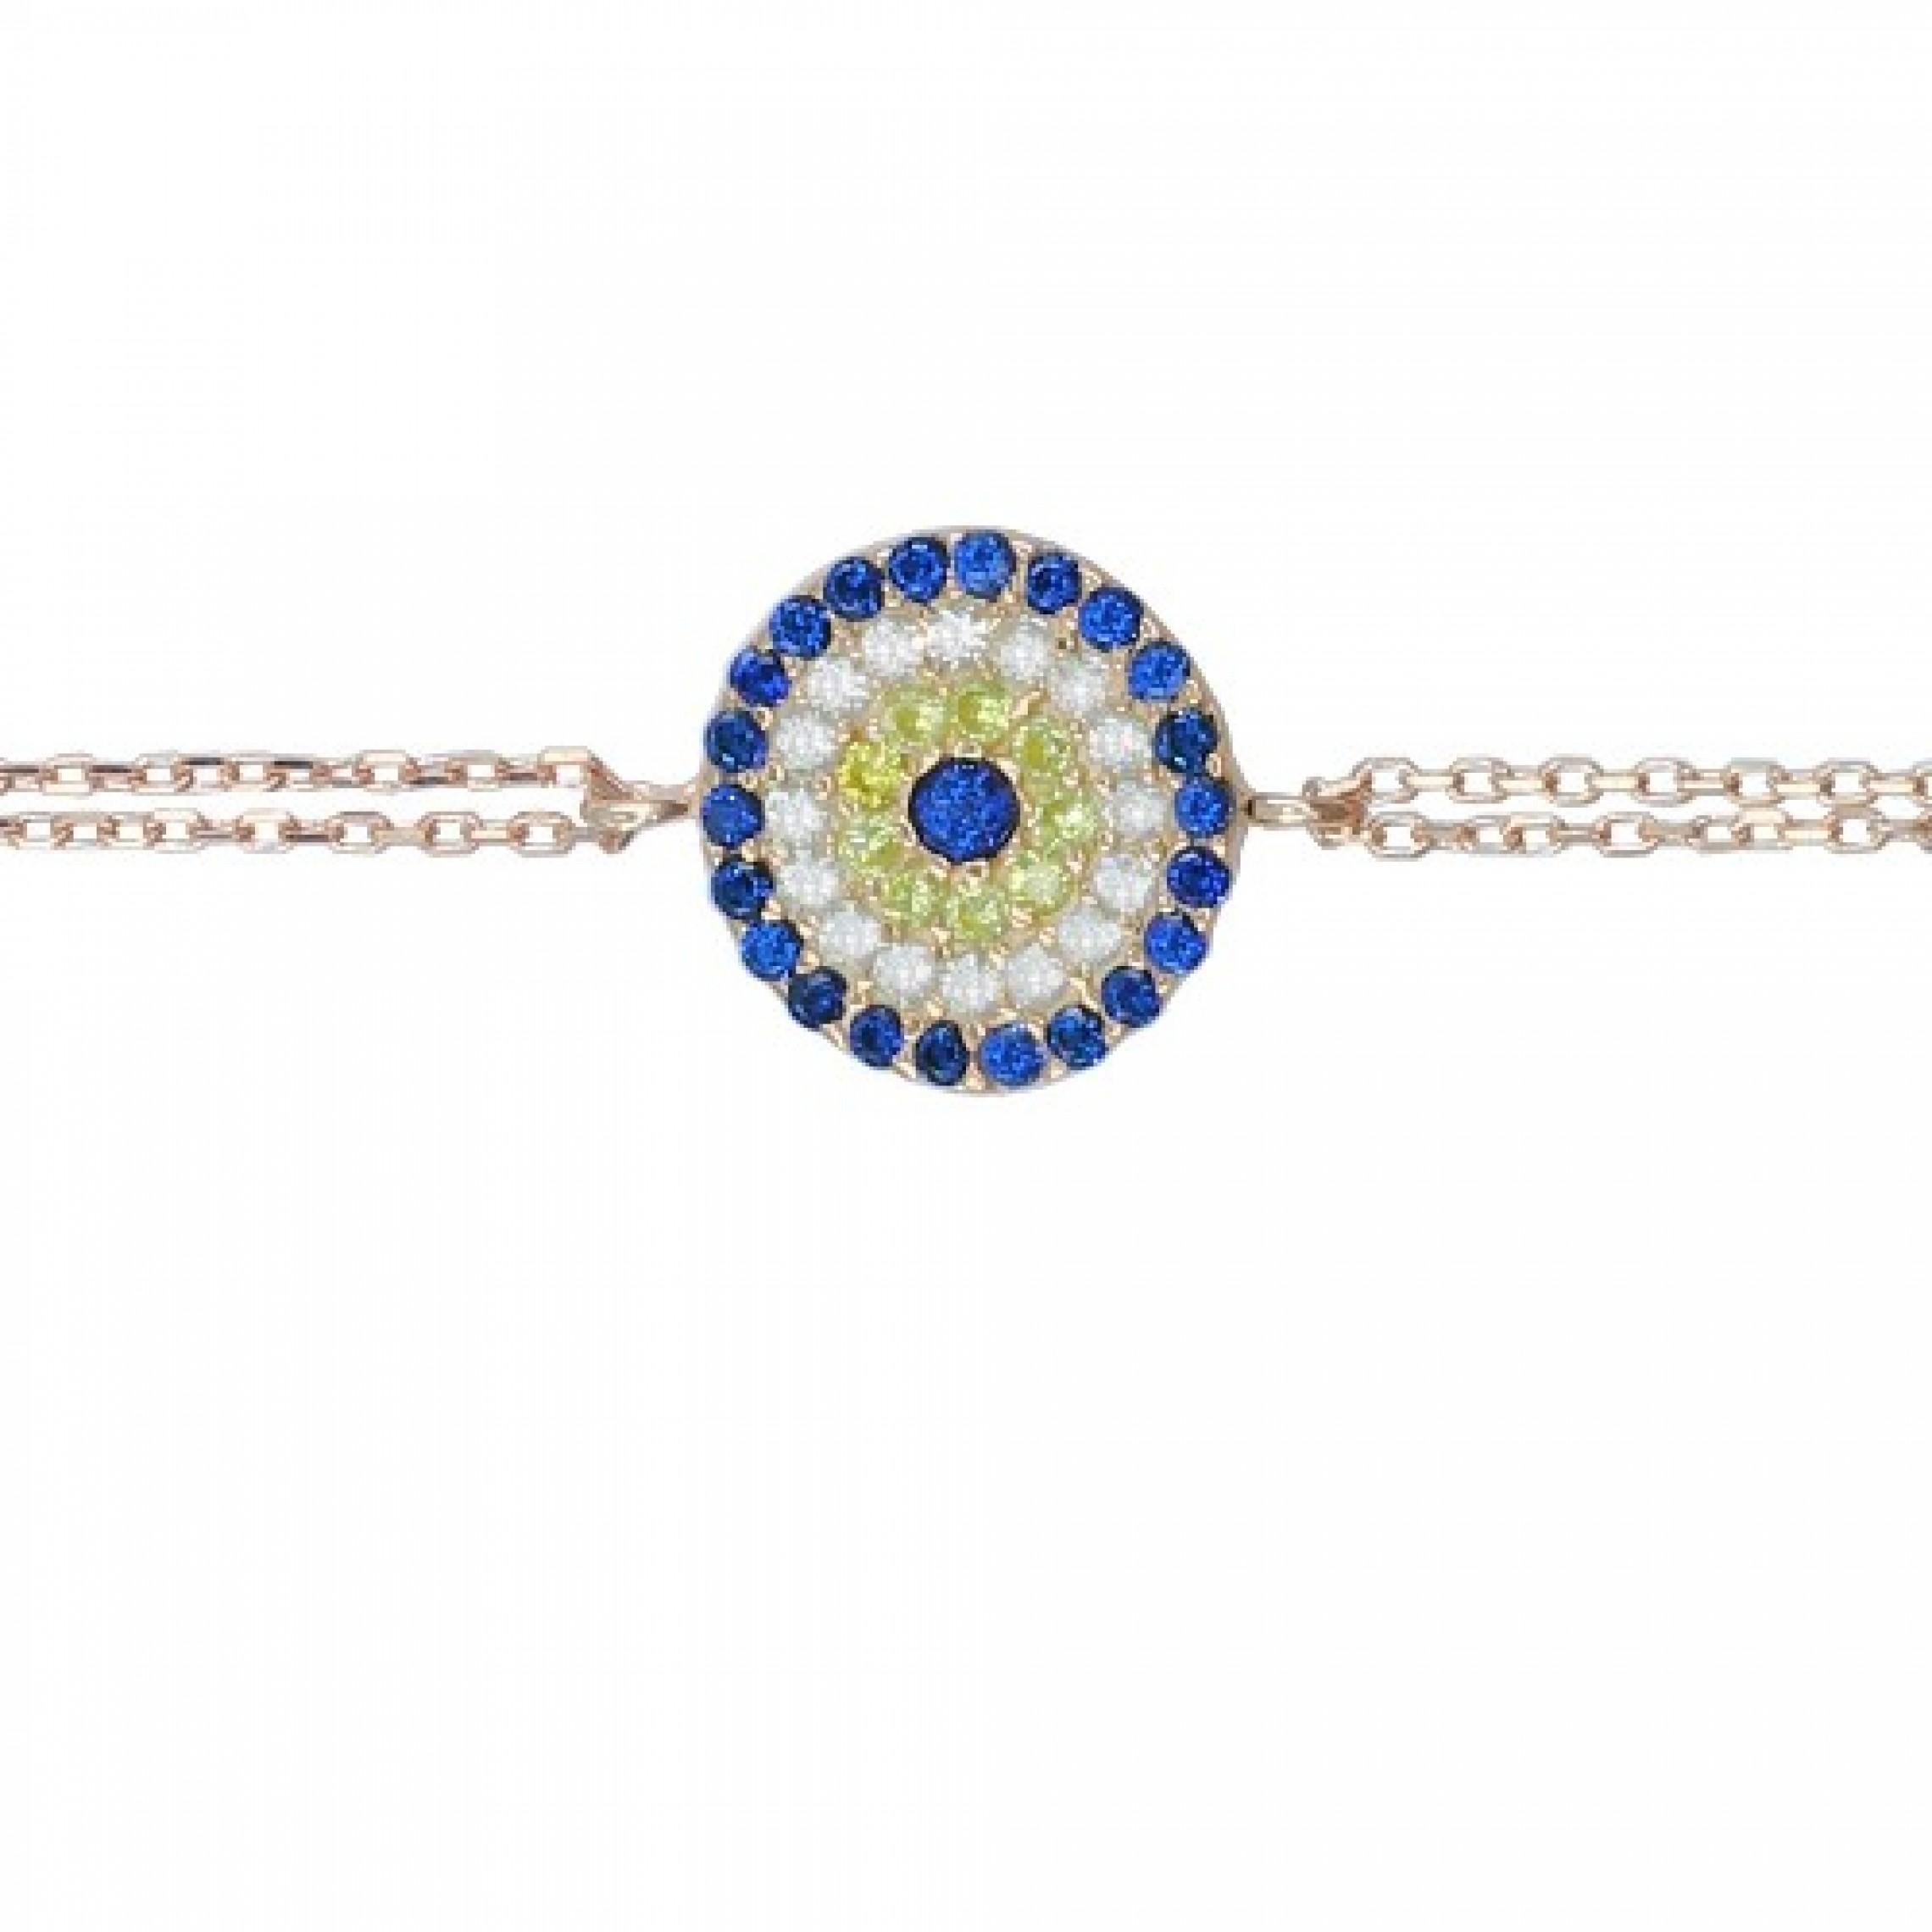 SB-61 Evil Eye 925 Sterling Silver CZ Bracelet